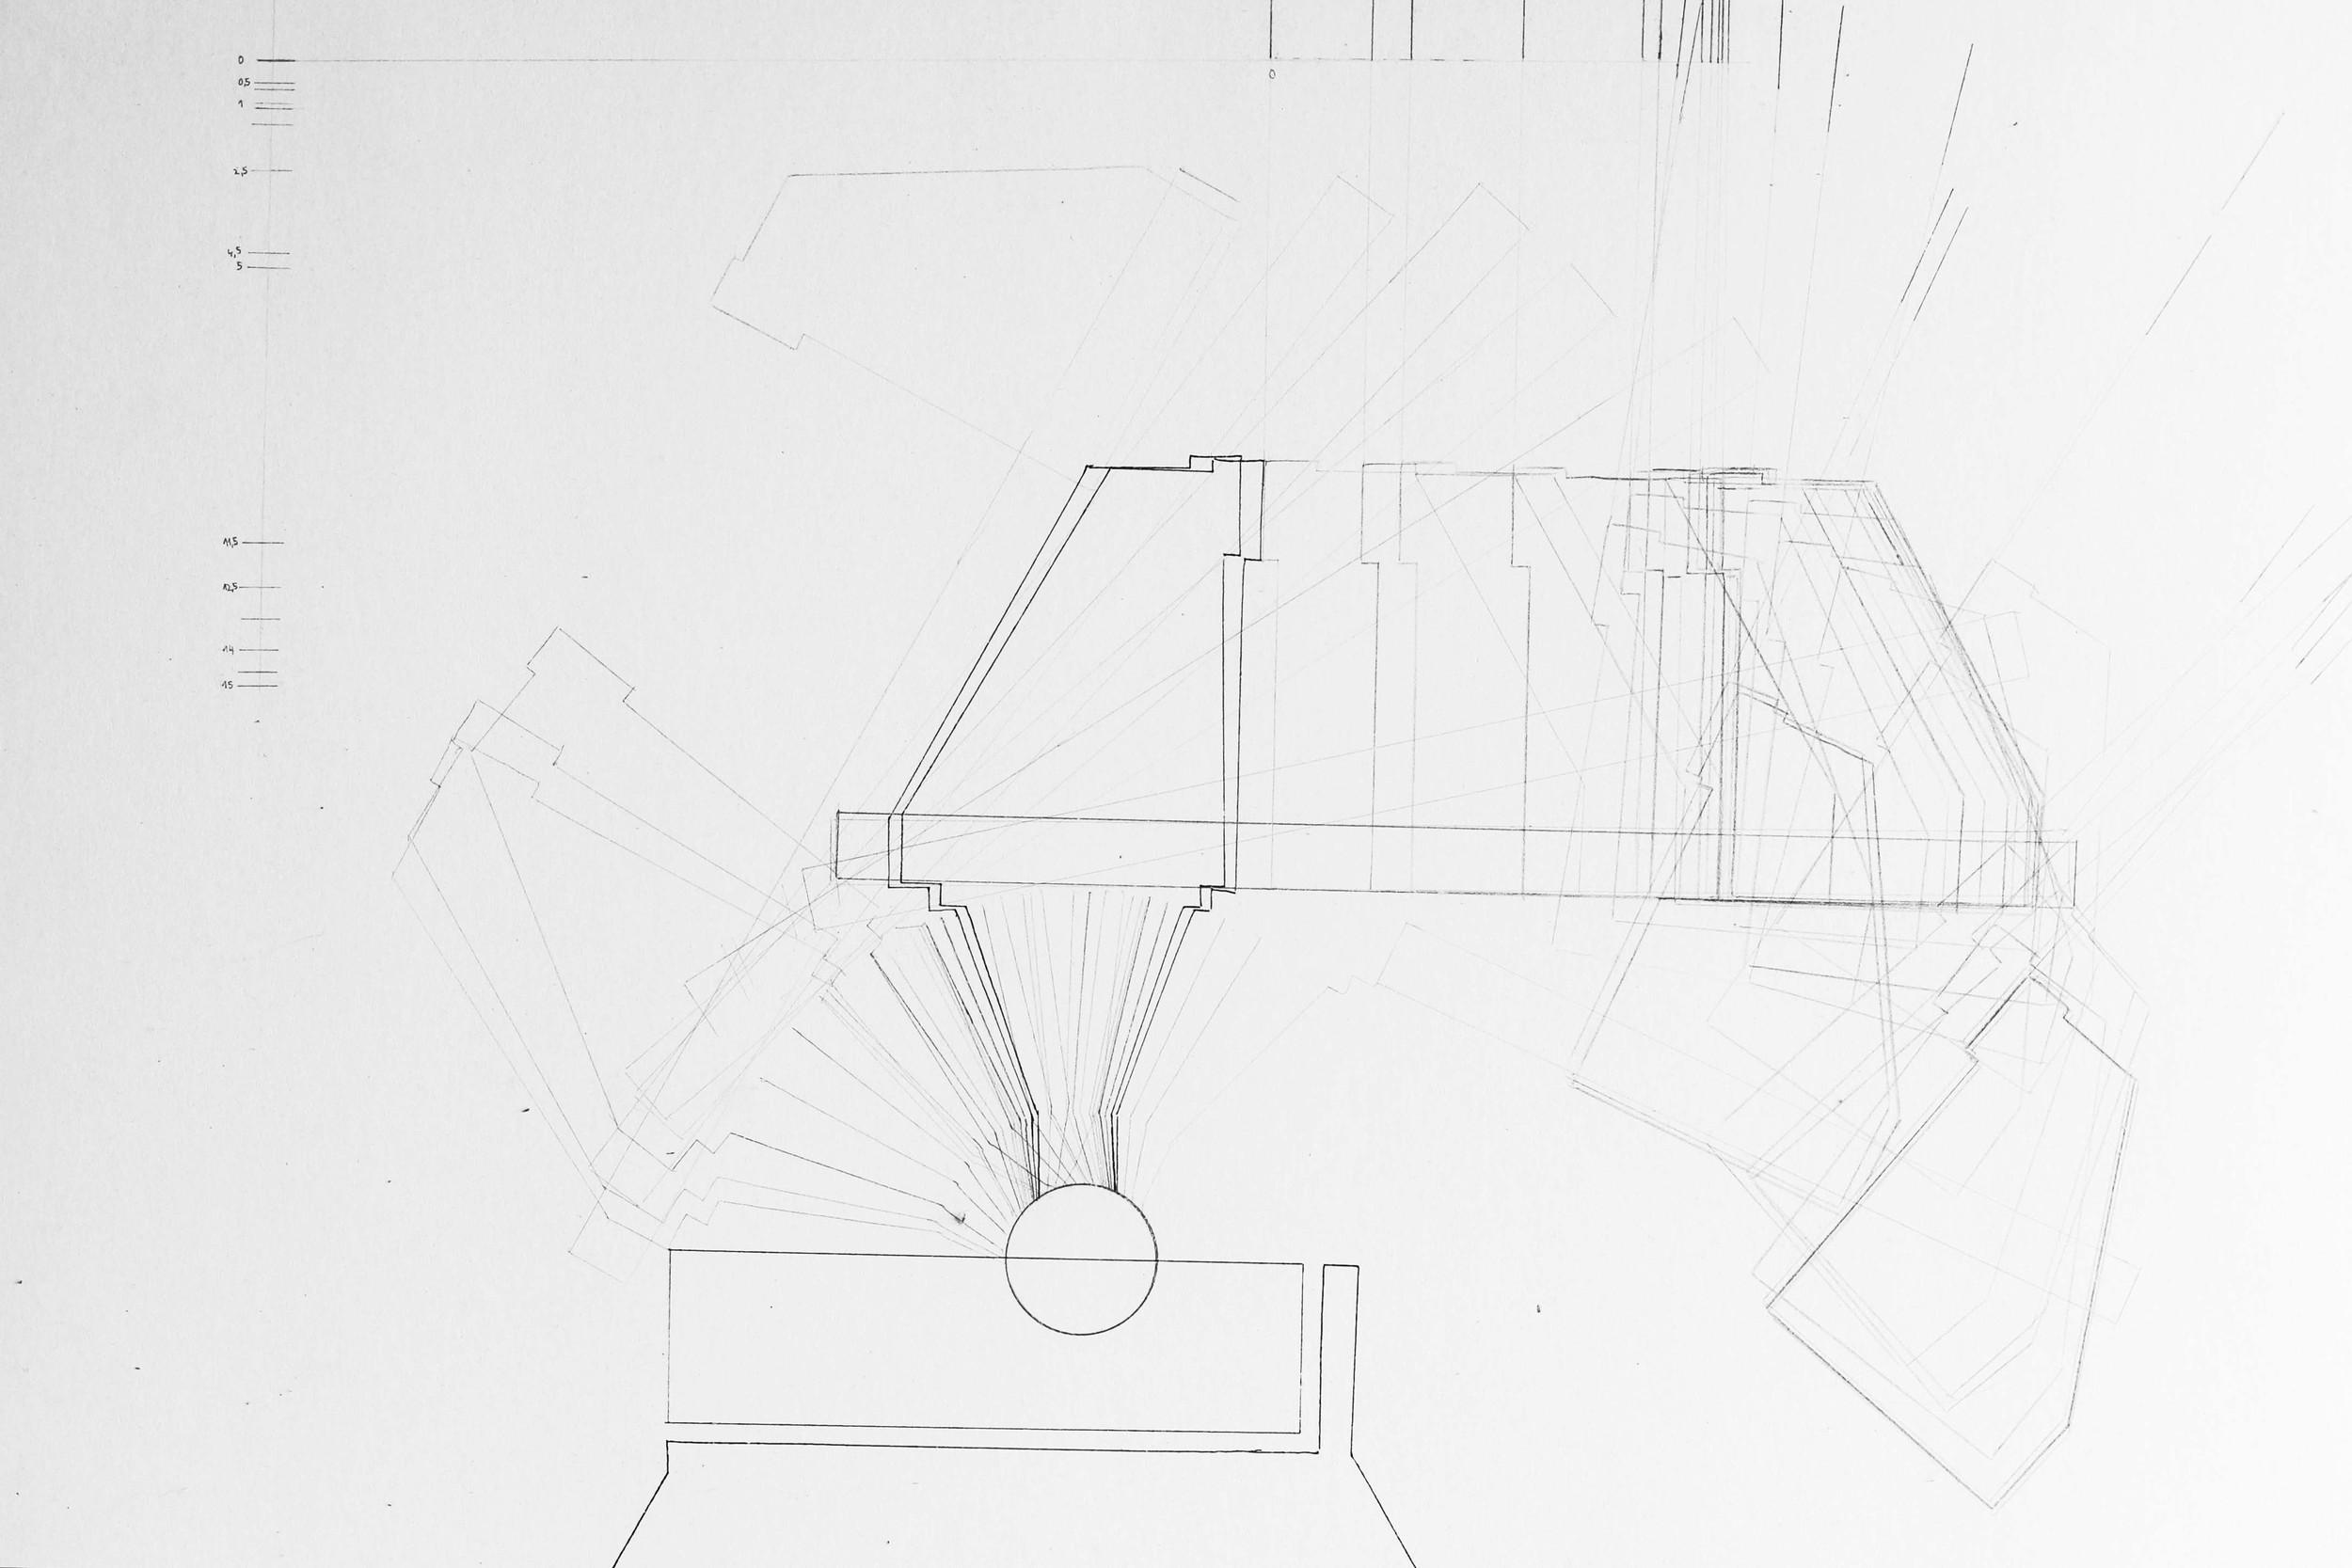 Darstellung II - Dynamik & Funktion Autor:Theresa Helena Begon